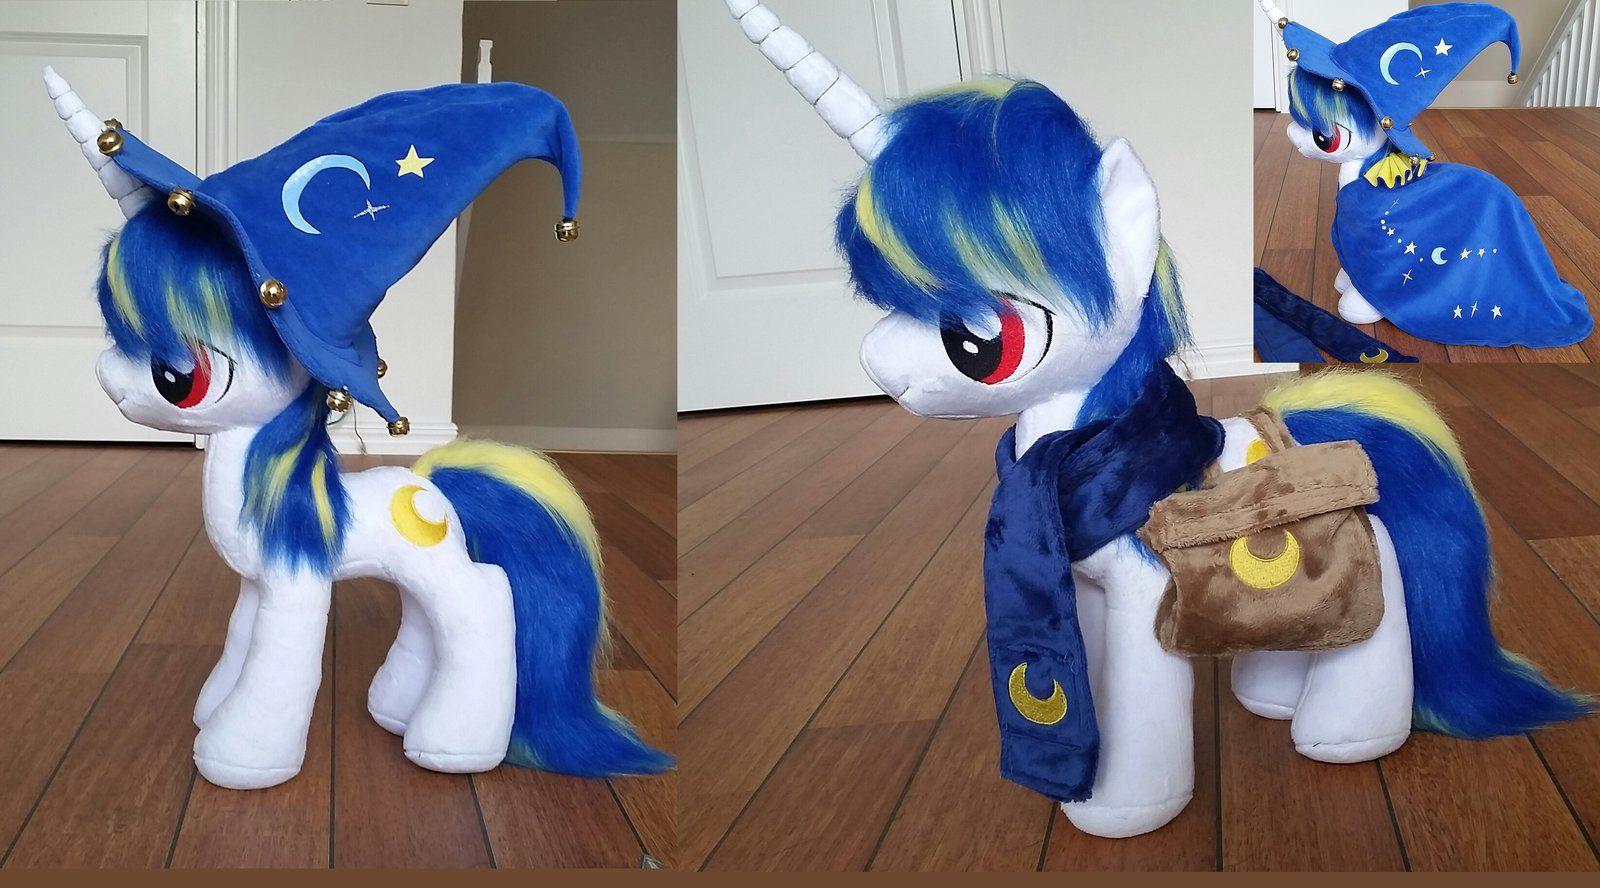 b08d17b8b443 OC male unicorn plush pony comission by Epicrainbowcrafts.deviantart.com on  @DeviantArt